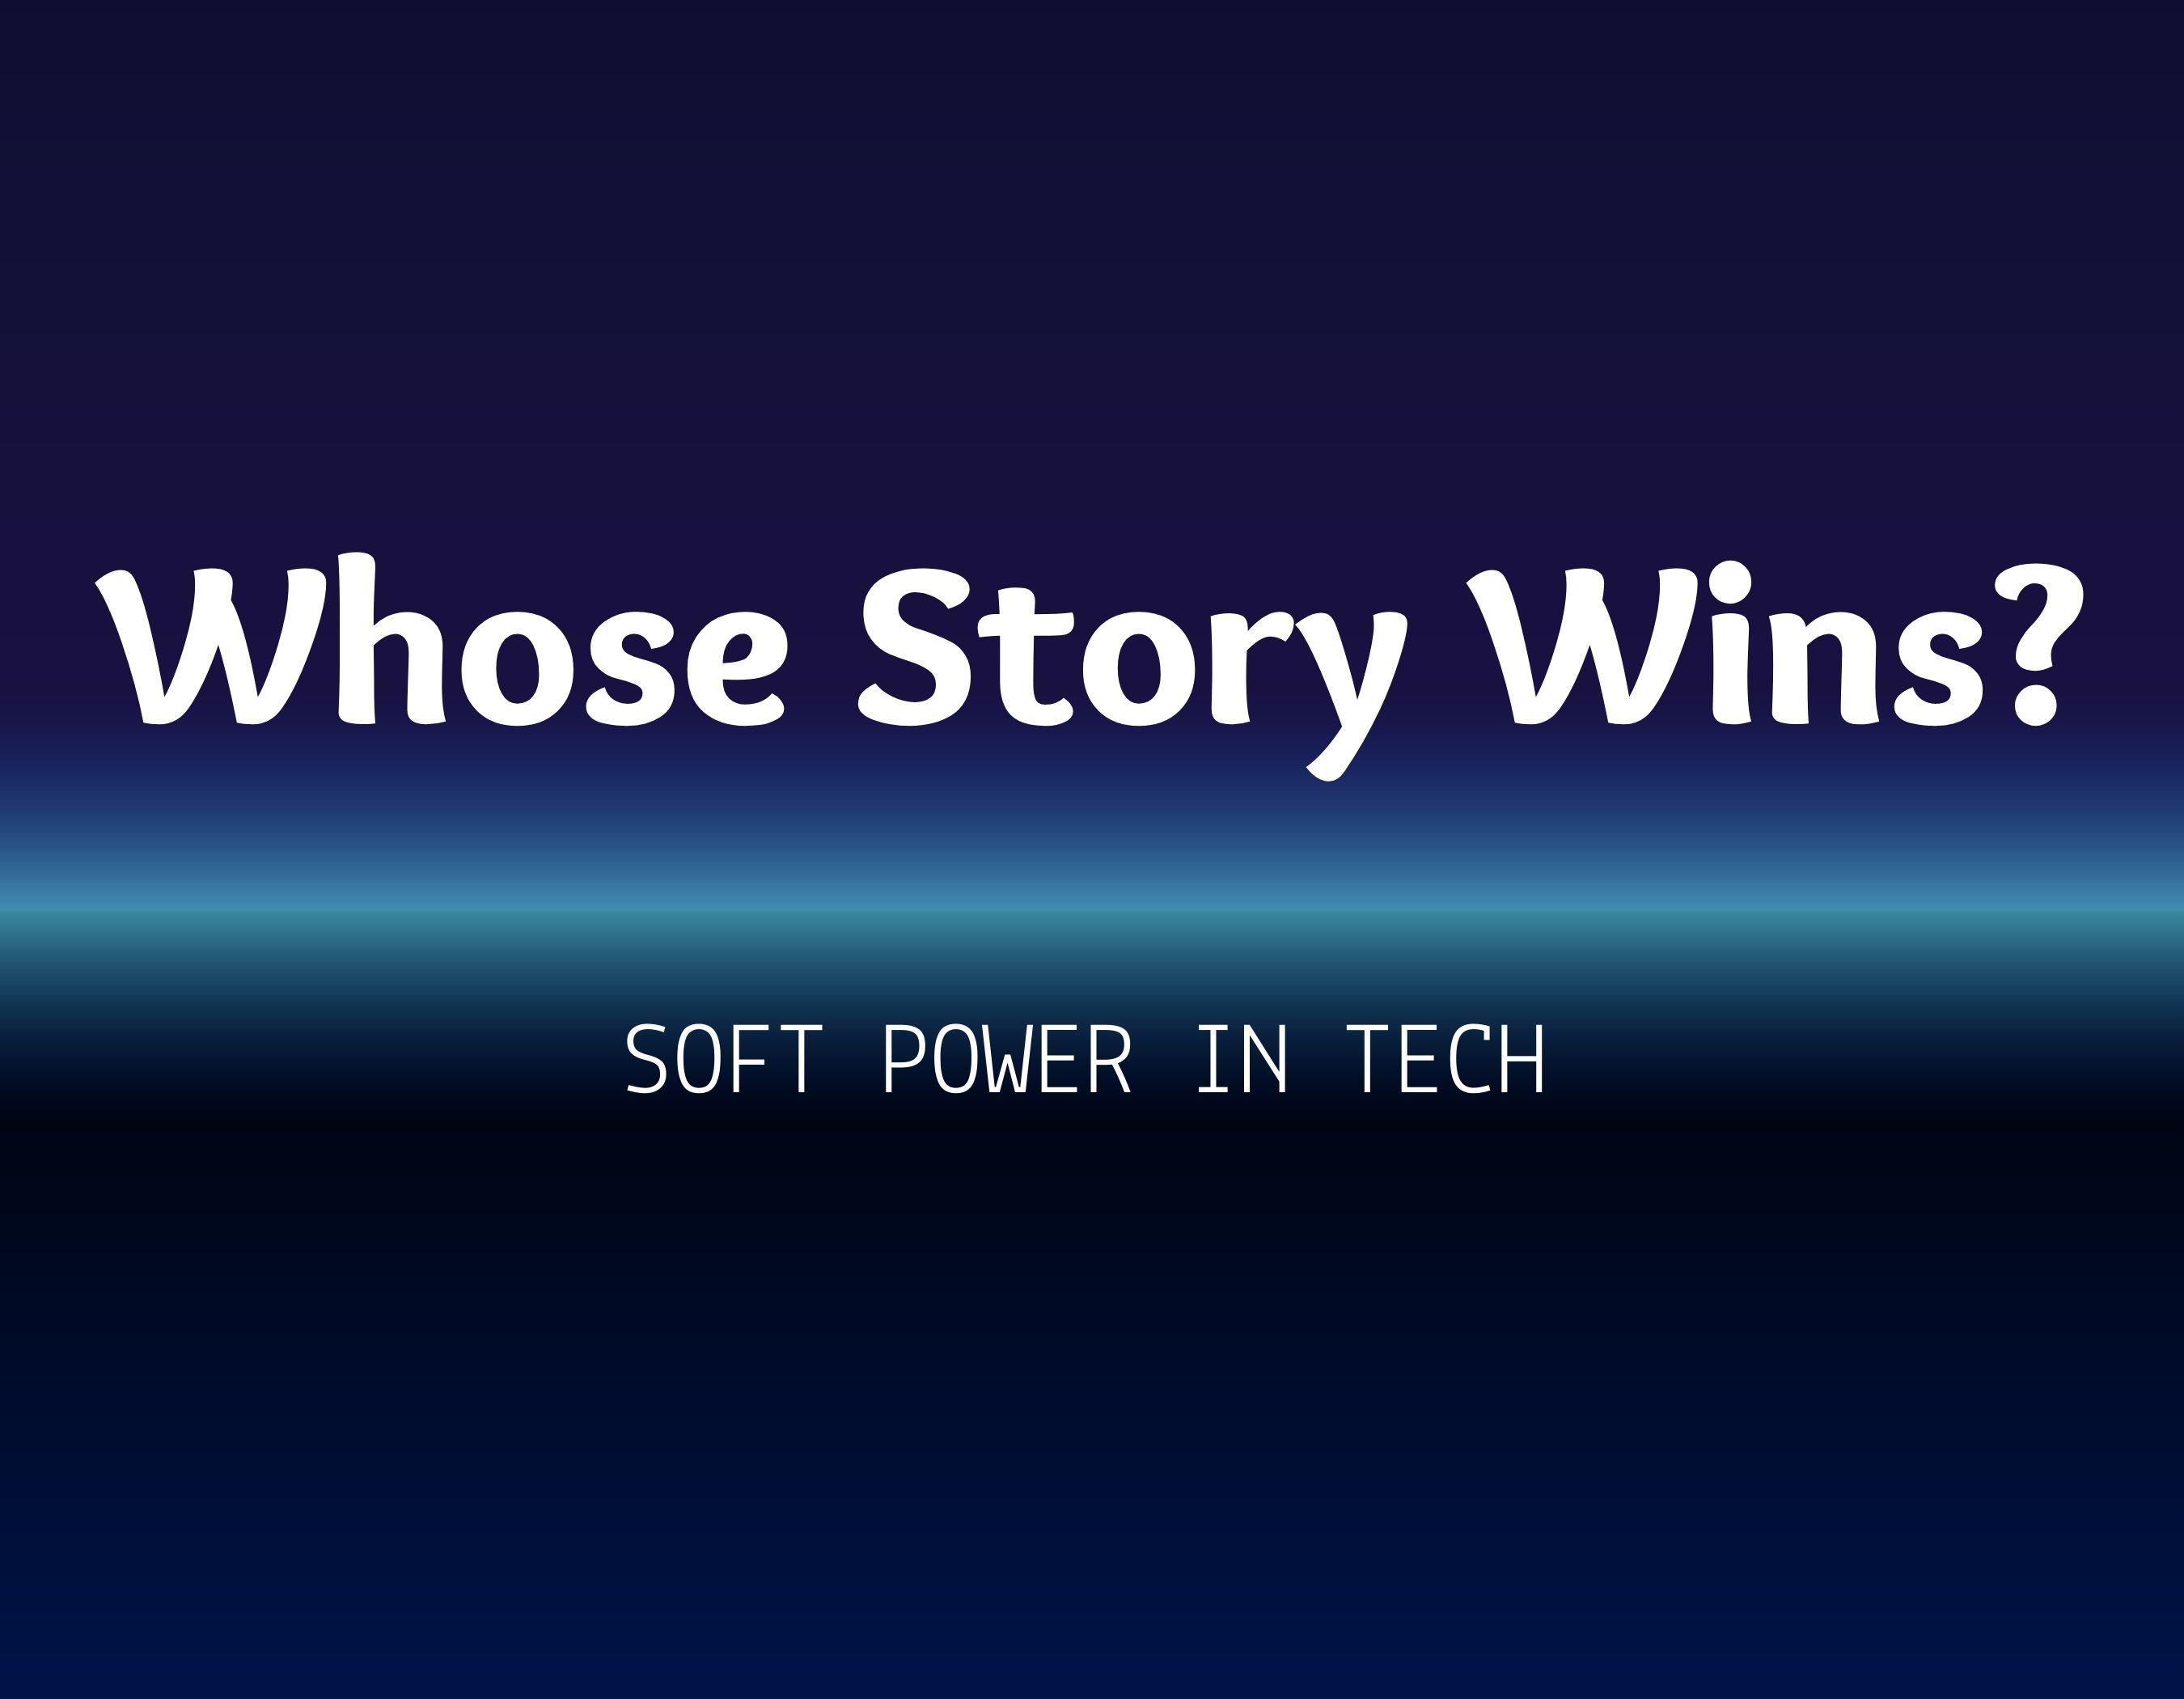 Whose Story Wins?